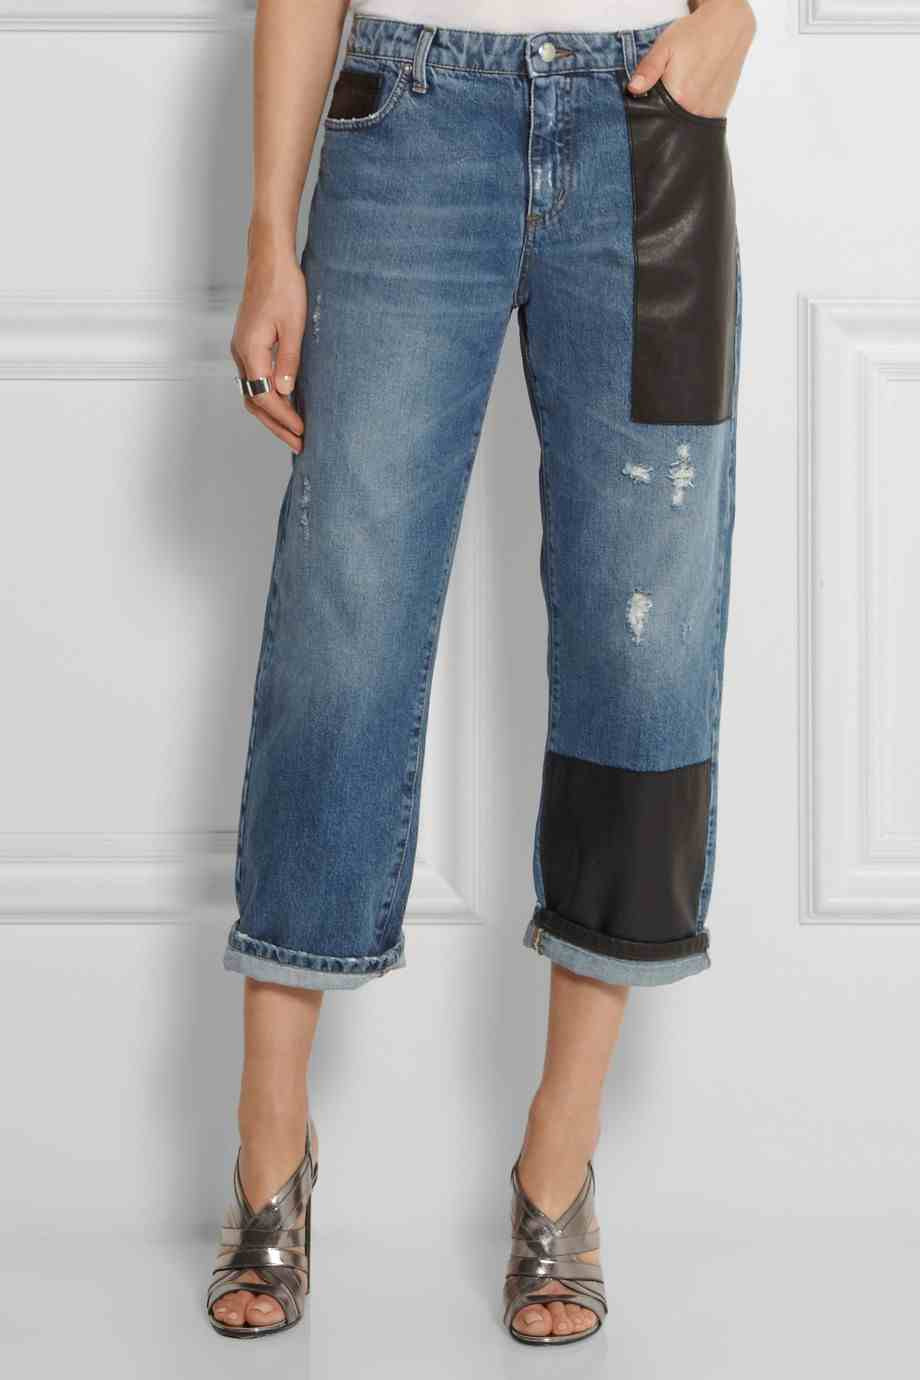 McQ Alexander McQueen - Jean(315 €)